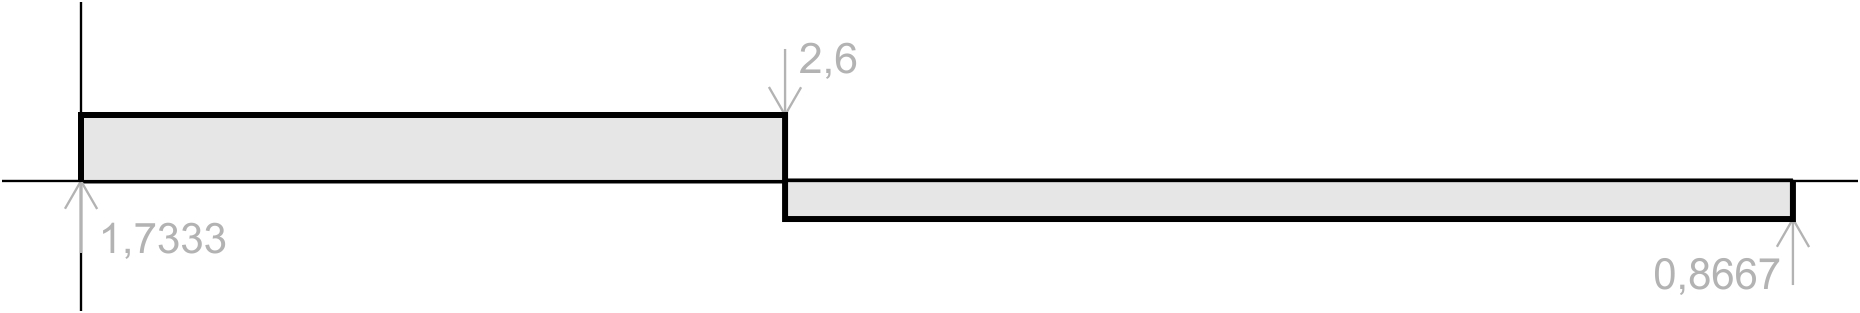 Exemplo 1.4.jpg